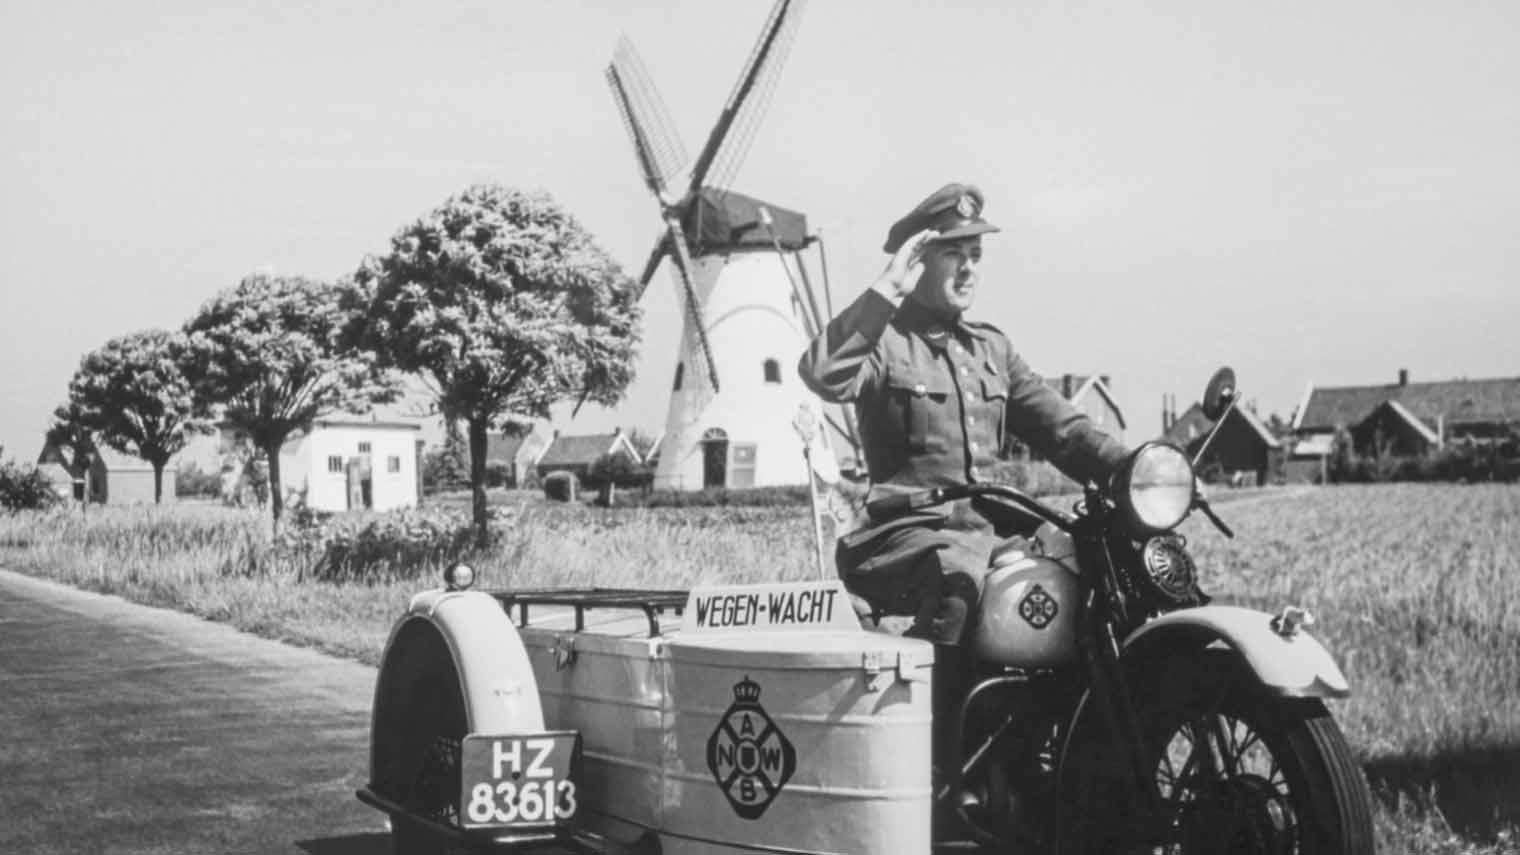 1951-Wegen-Wacht-